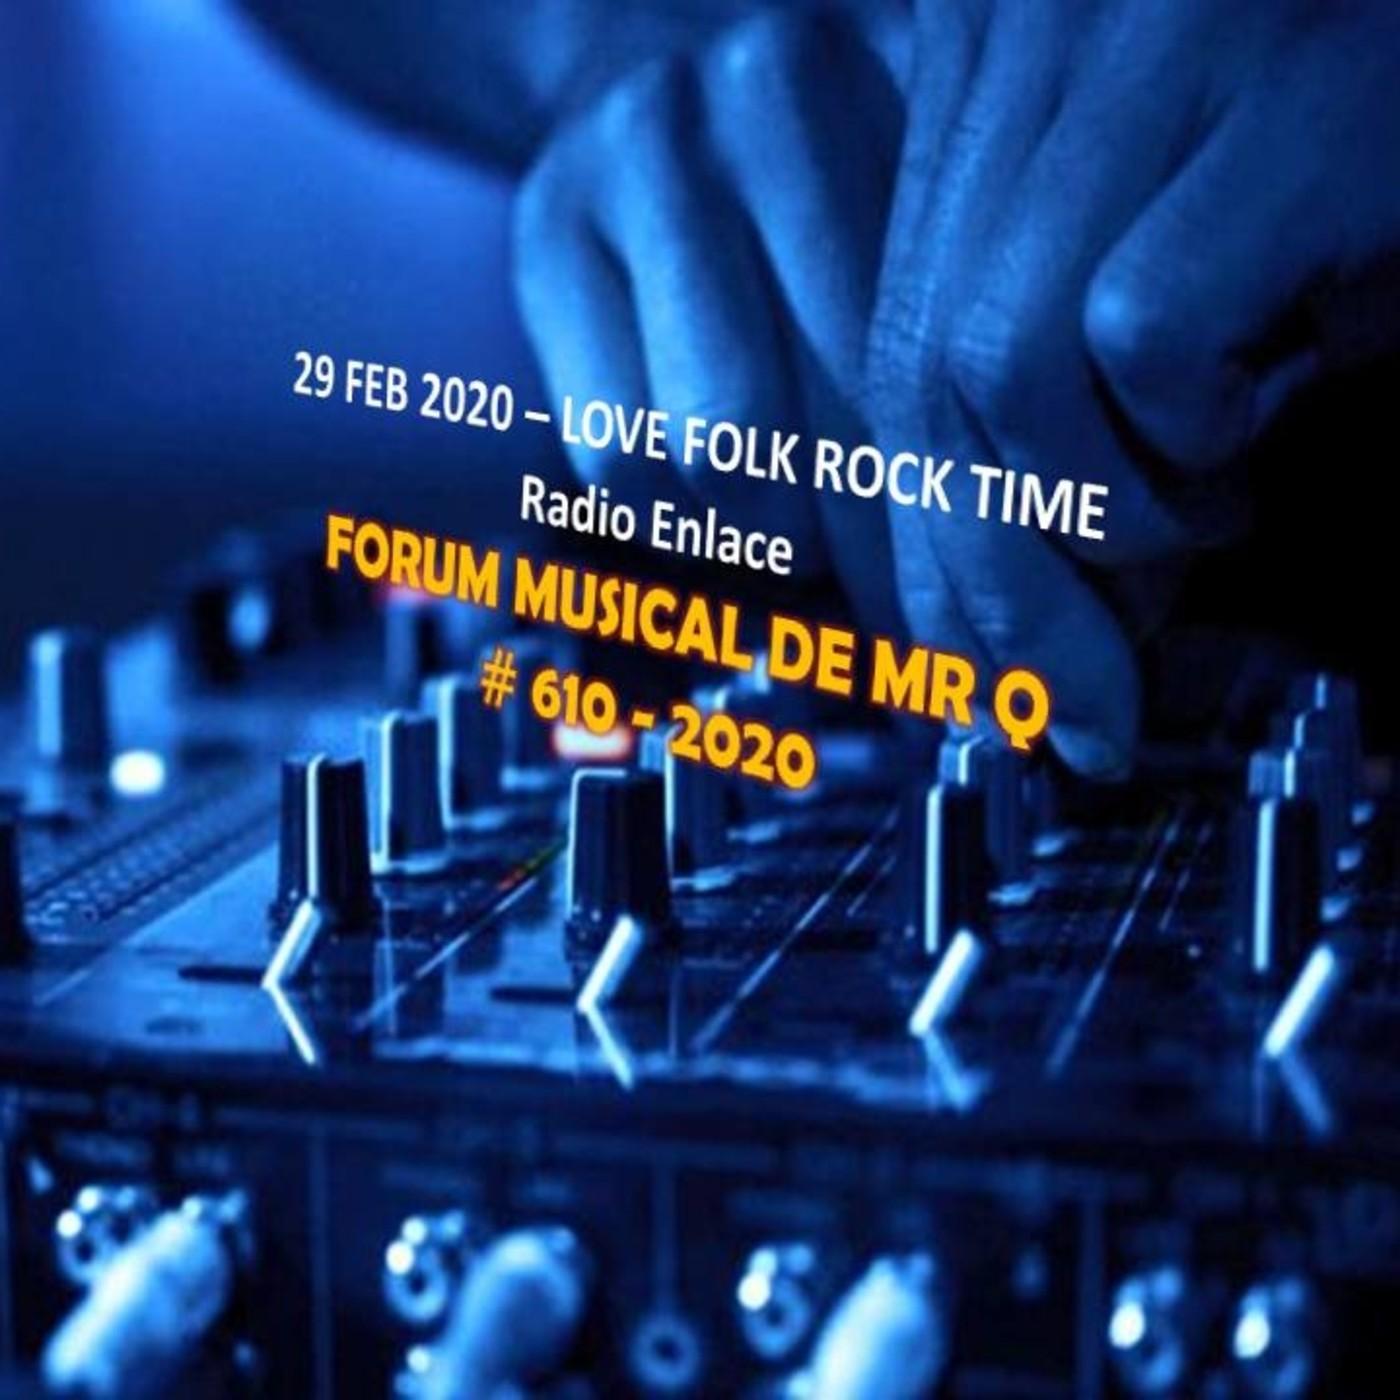 Forum Musical de Mr Q # 610 Q's FOLK ROCK